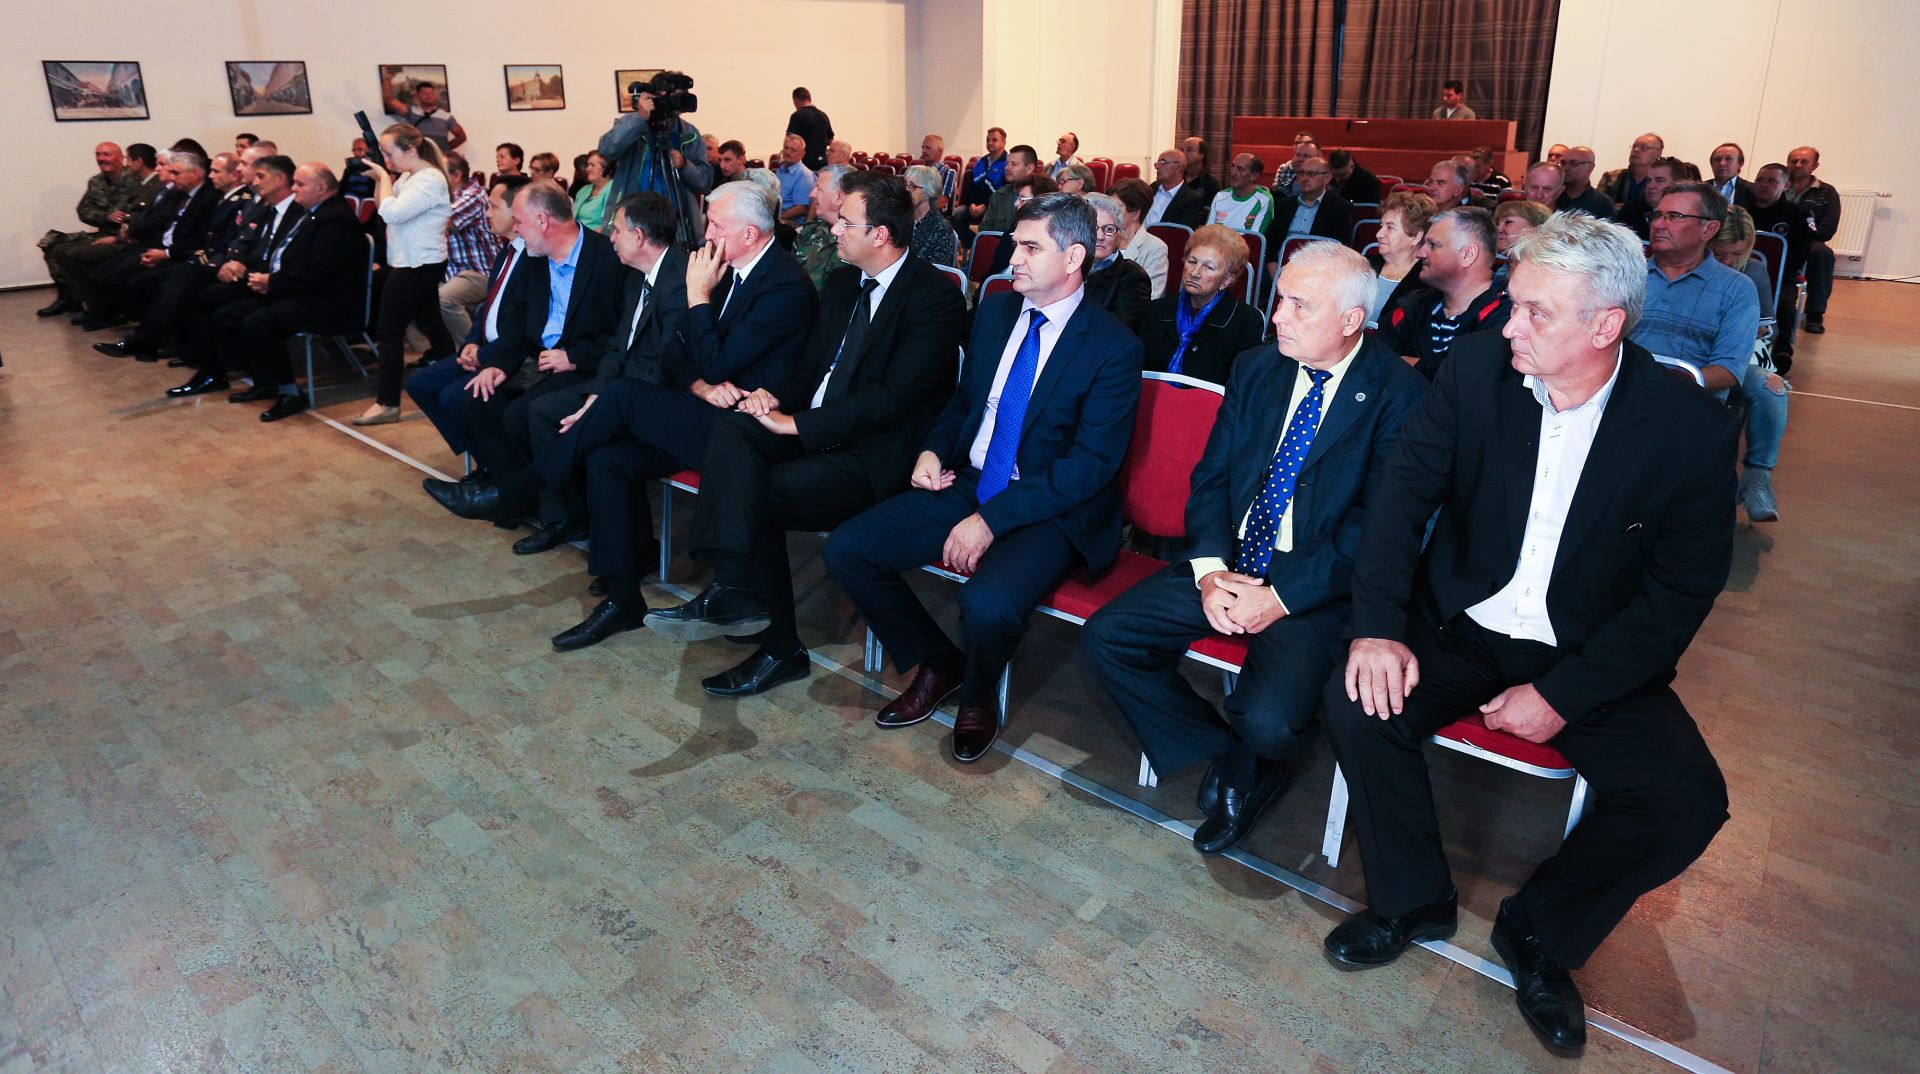 Obilježena 25. obljetnica ustroja 204. vukovarske brigade